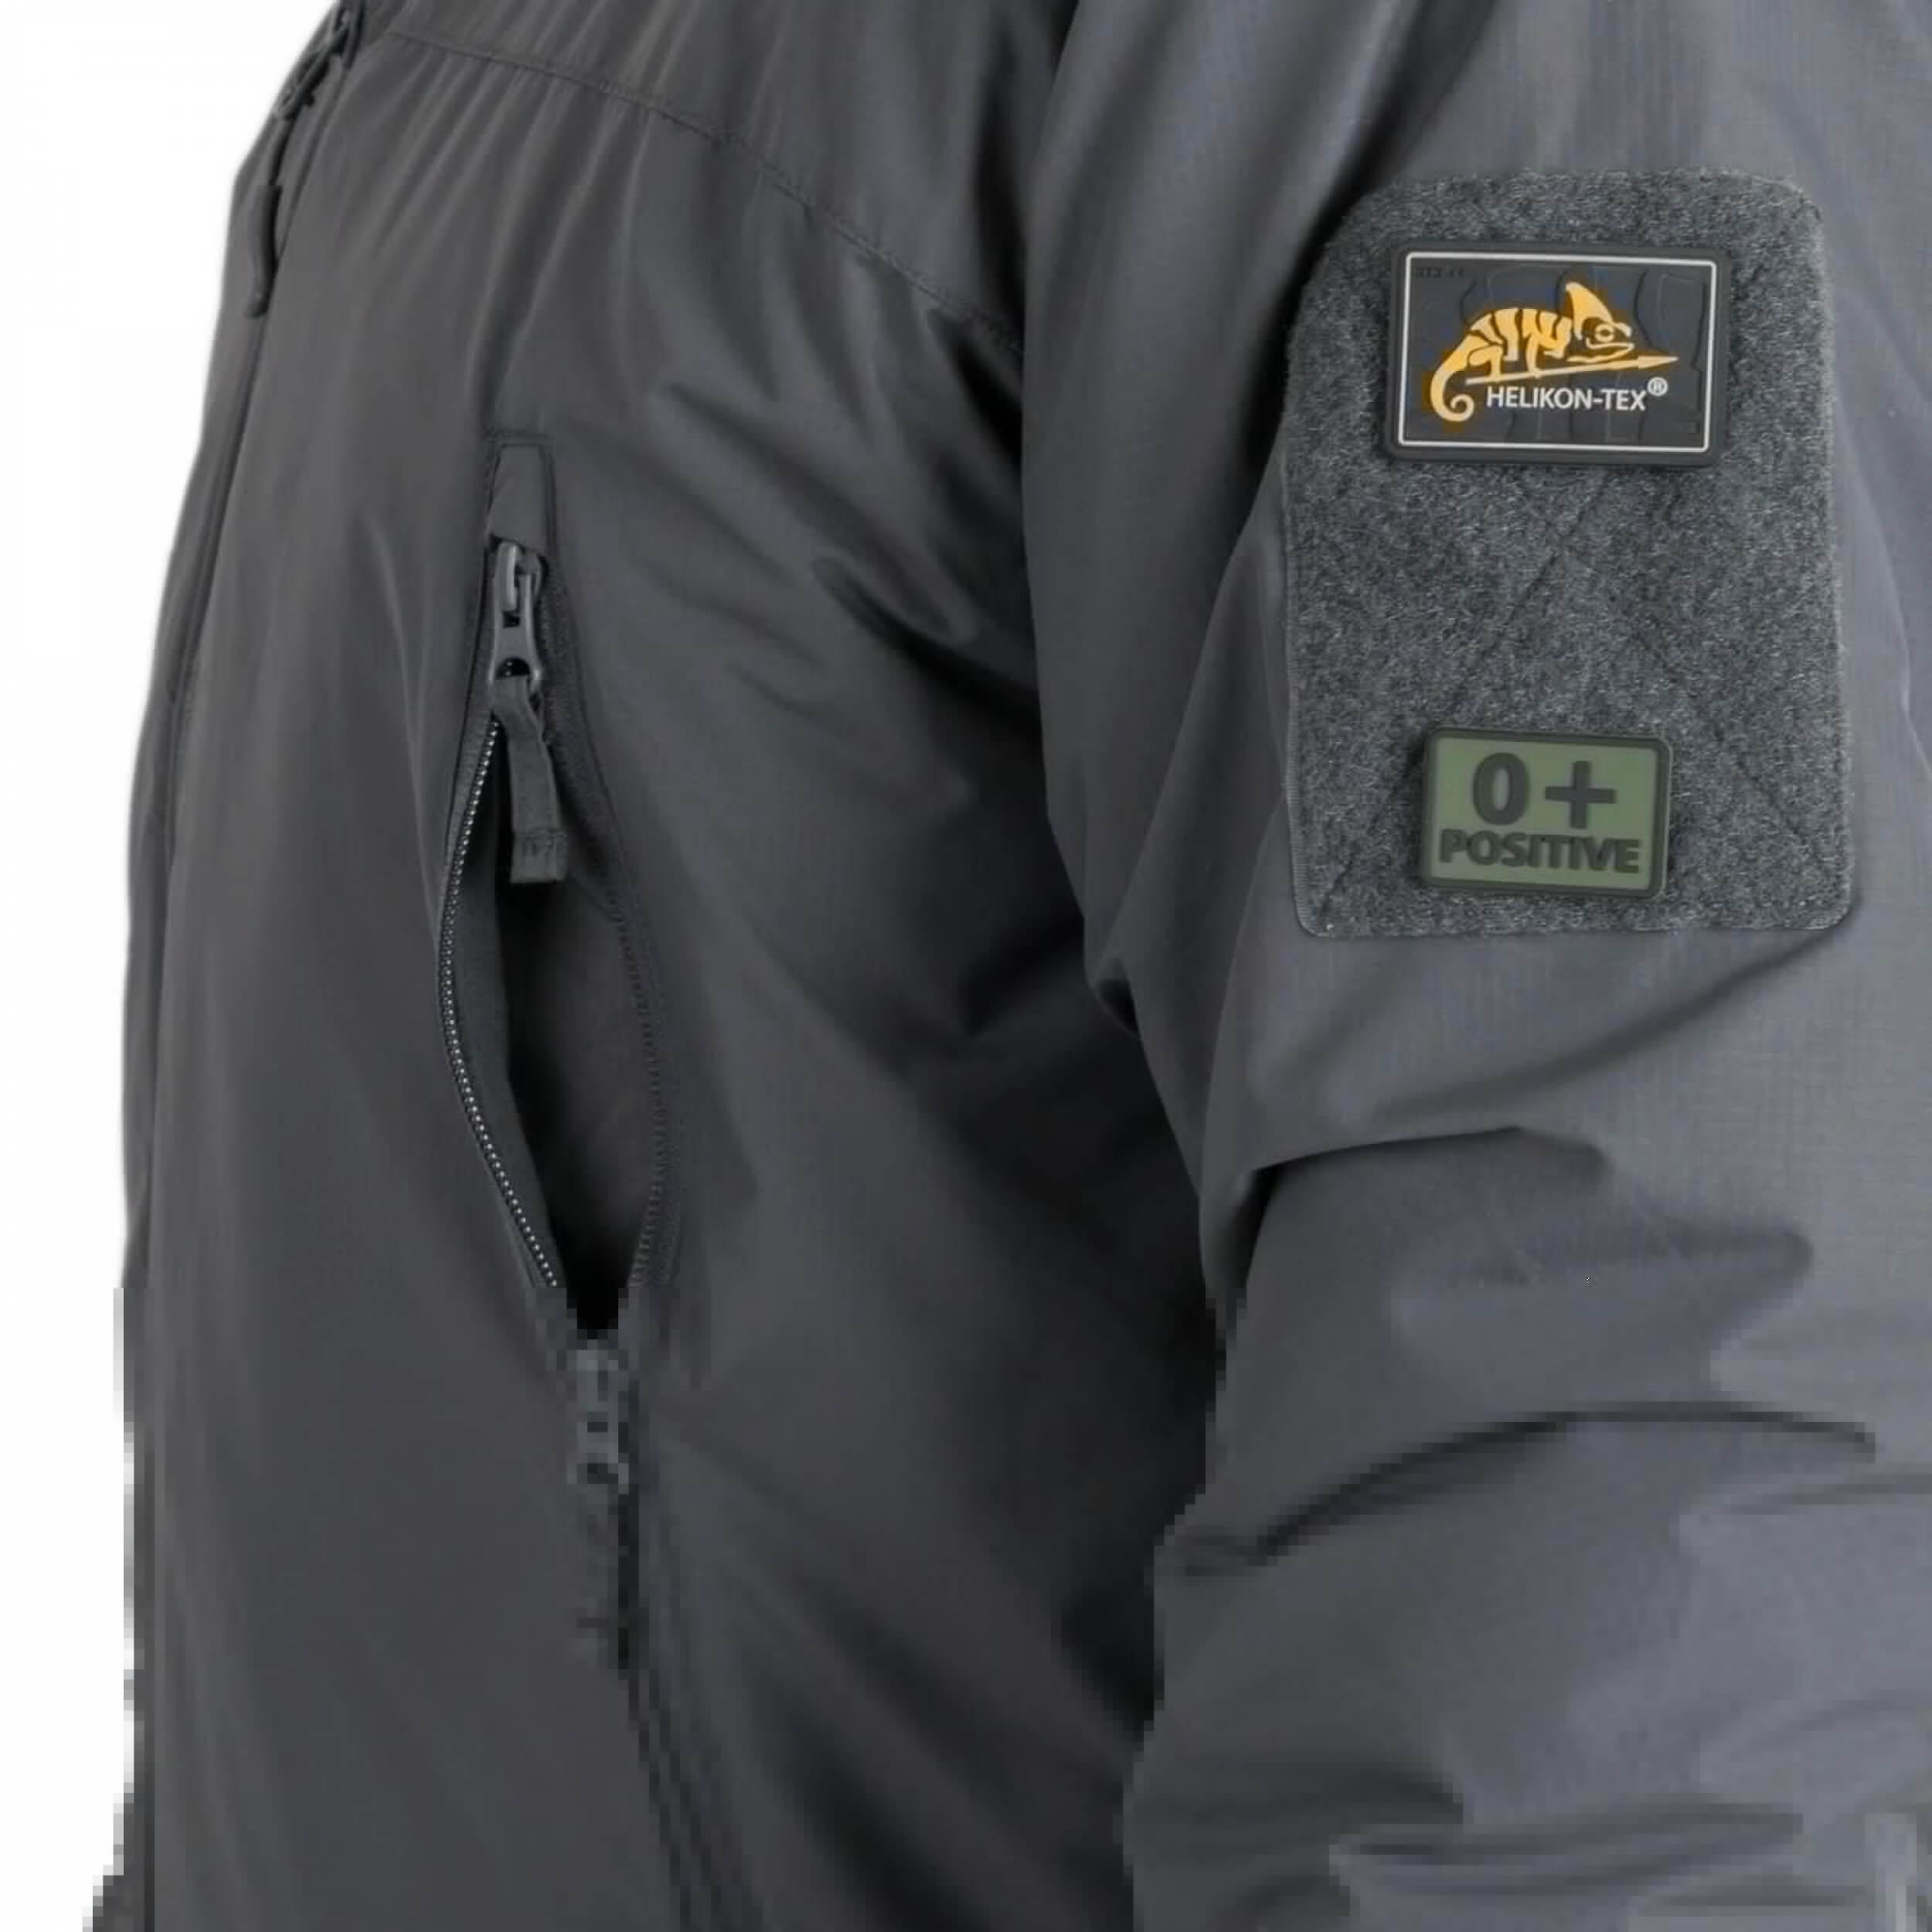 Helikon-Tex LEVEL 7 CLIMASHIELD® APEX 100g Winter Jacke Bundeswehr FLECKTARN (gb)